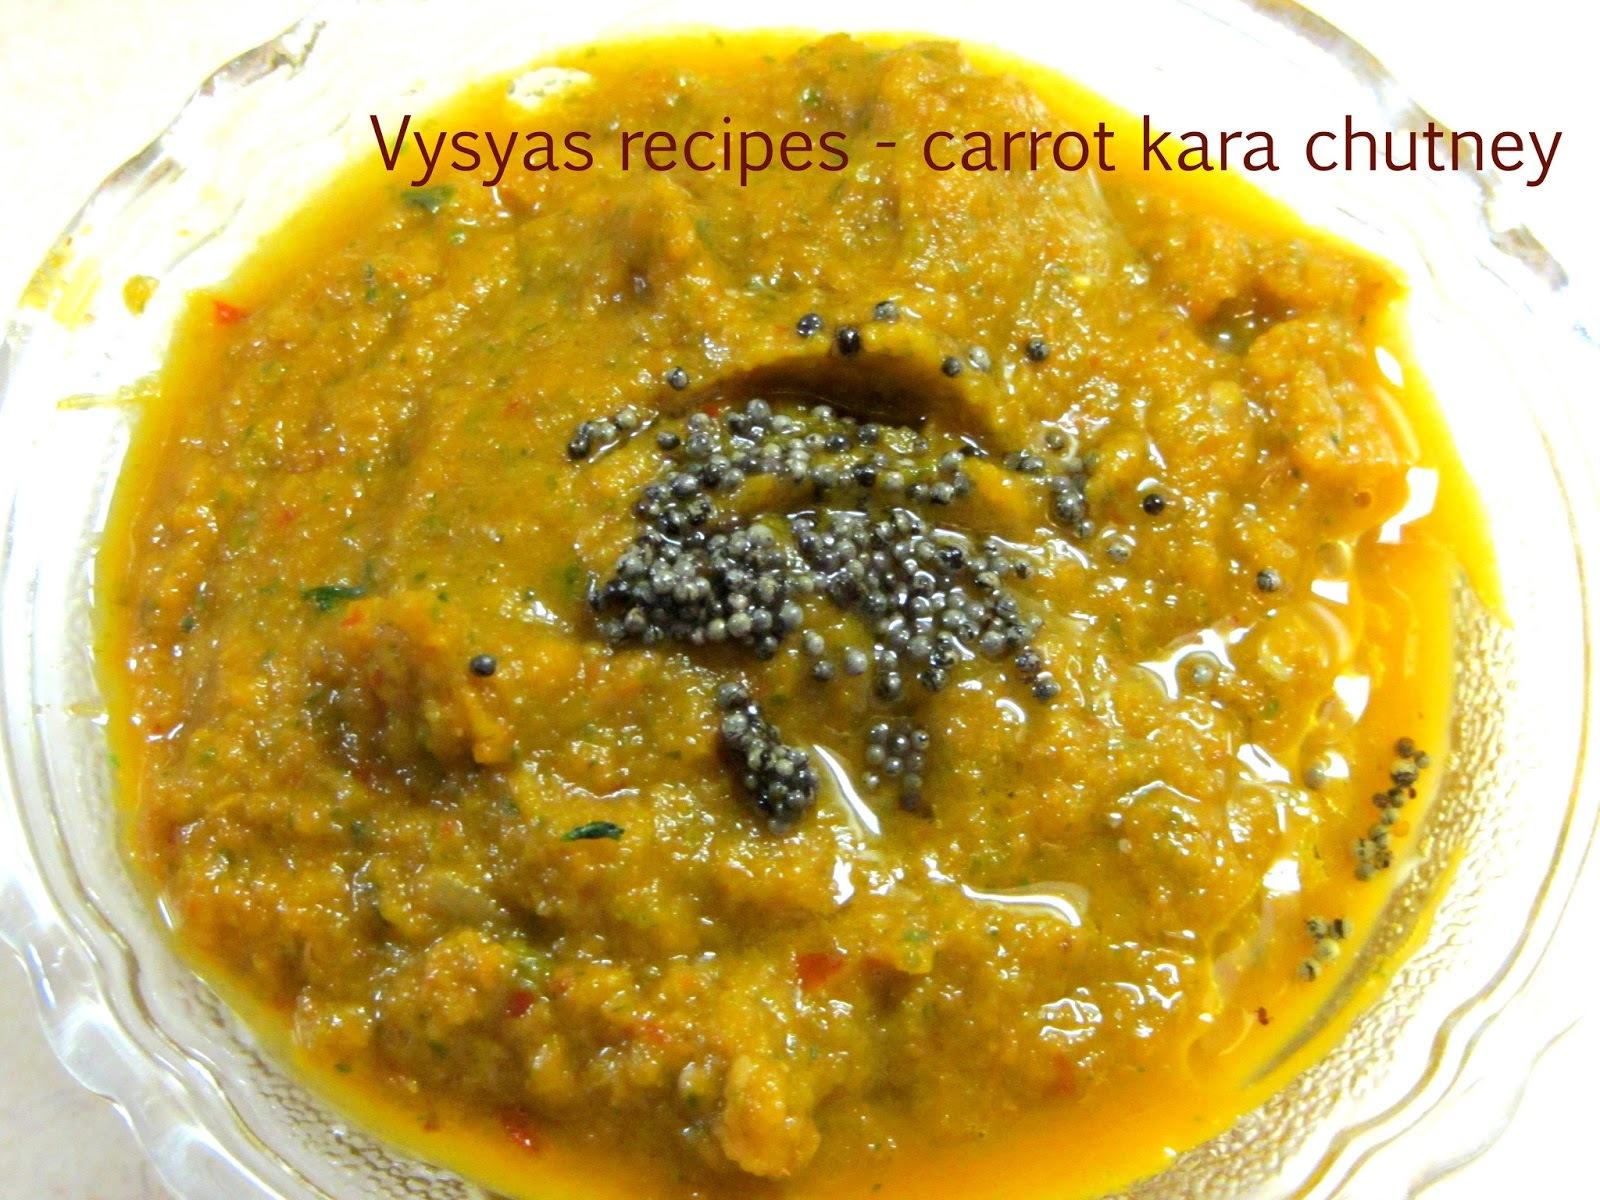 Spicy Carrot chutney - carrot kara chutney - How to make carrot kara chutney